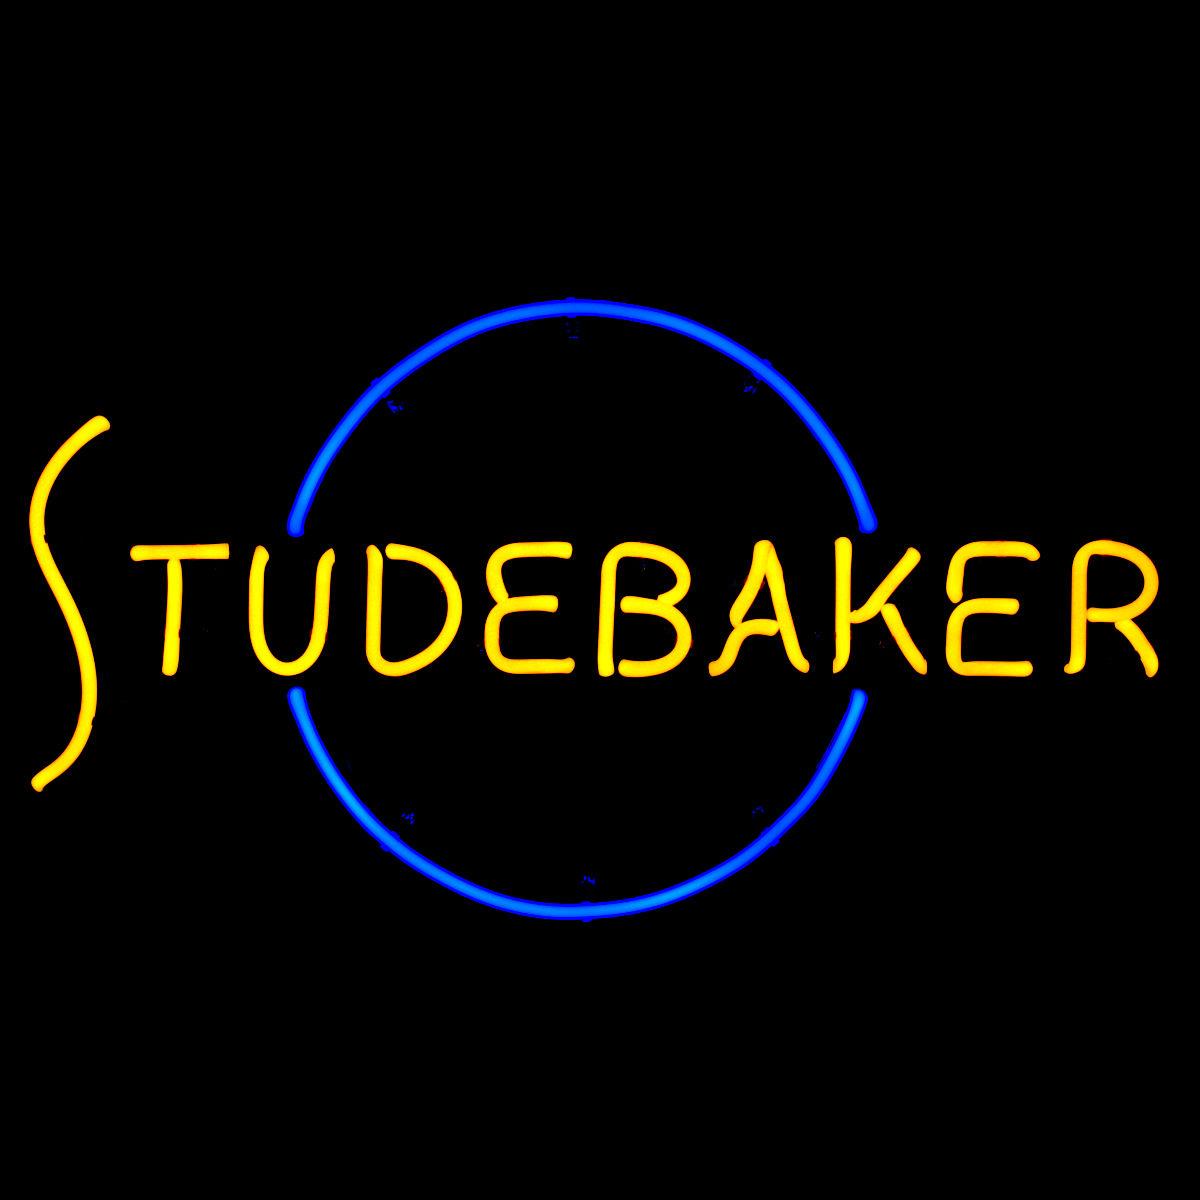 STUDEBAKER NEON SIGNS by John Barton - former Studebaker New Car Dealer - BartonNeonMagic.com